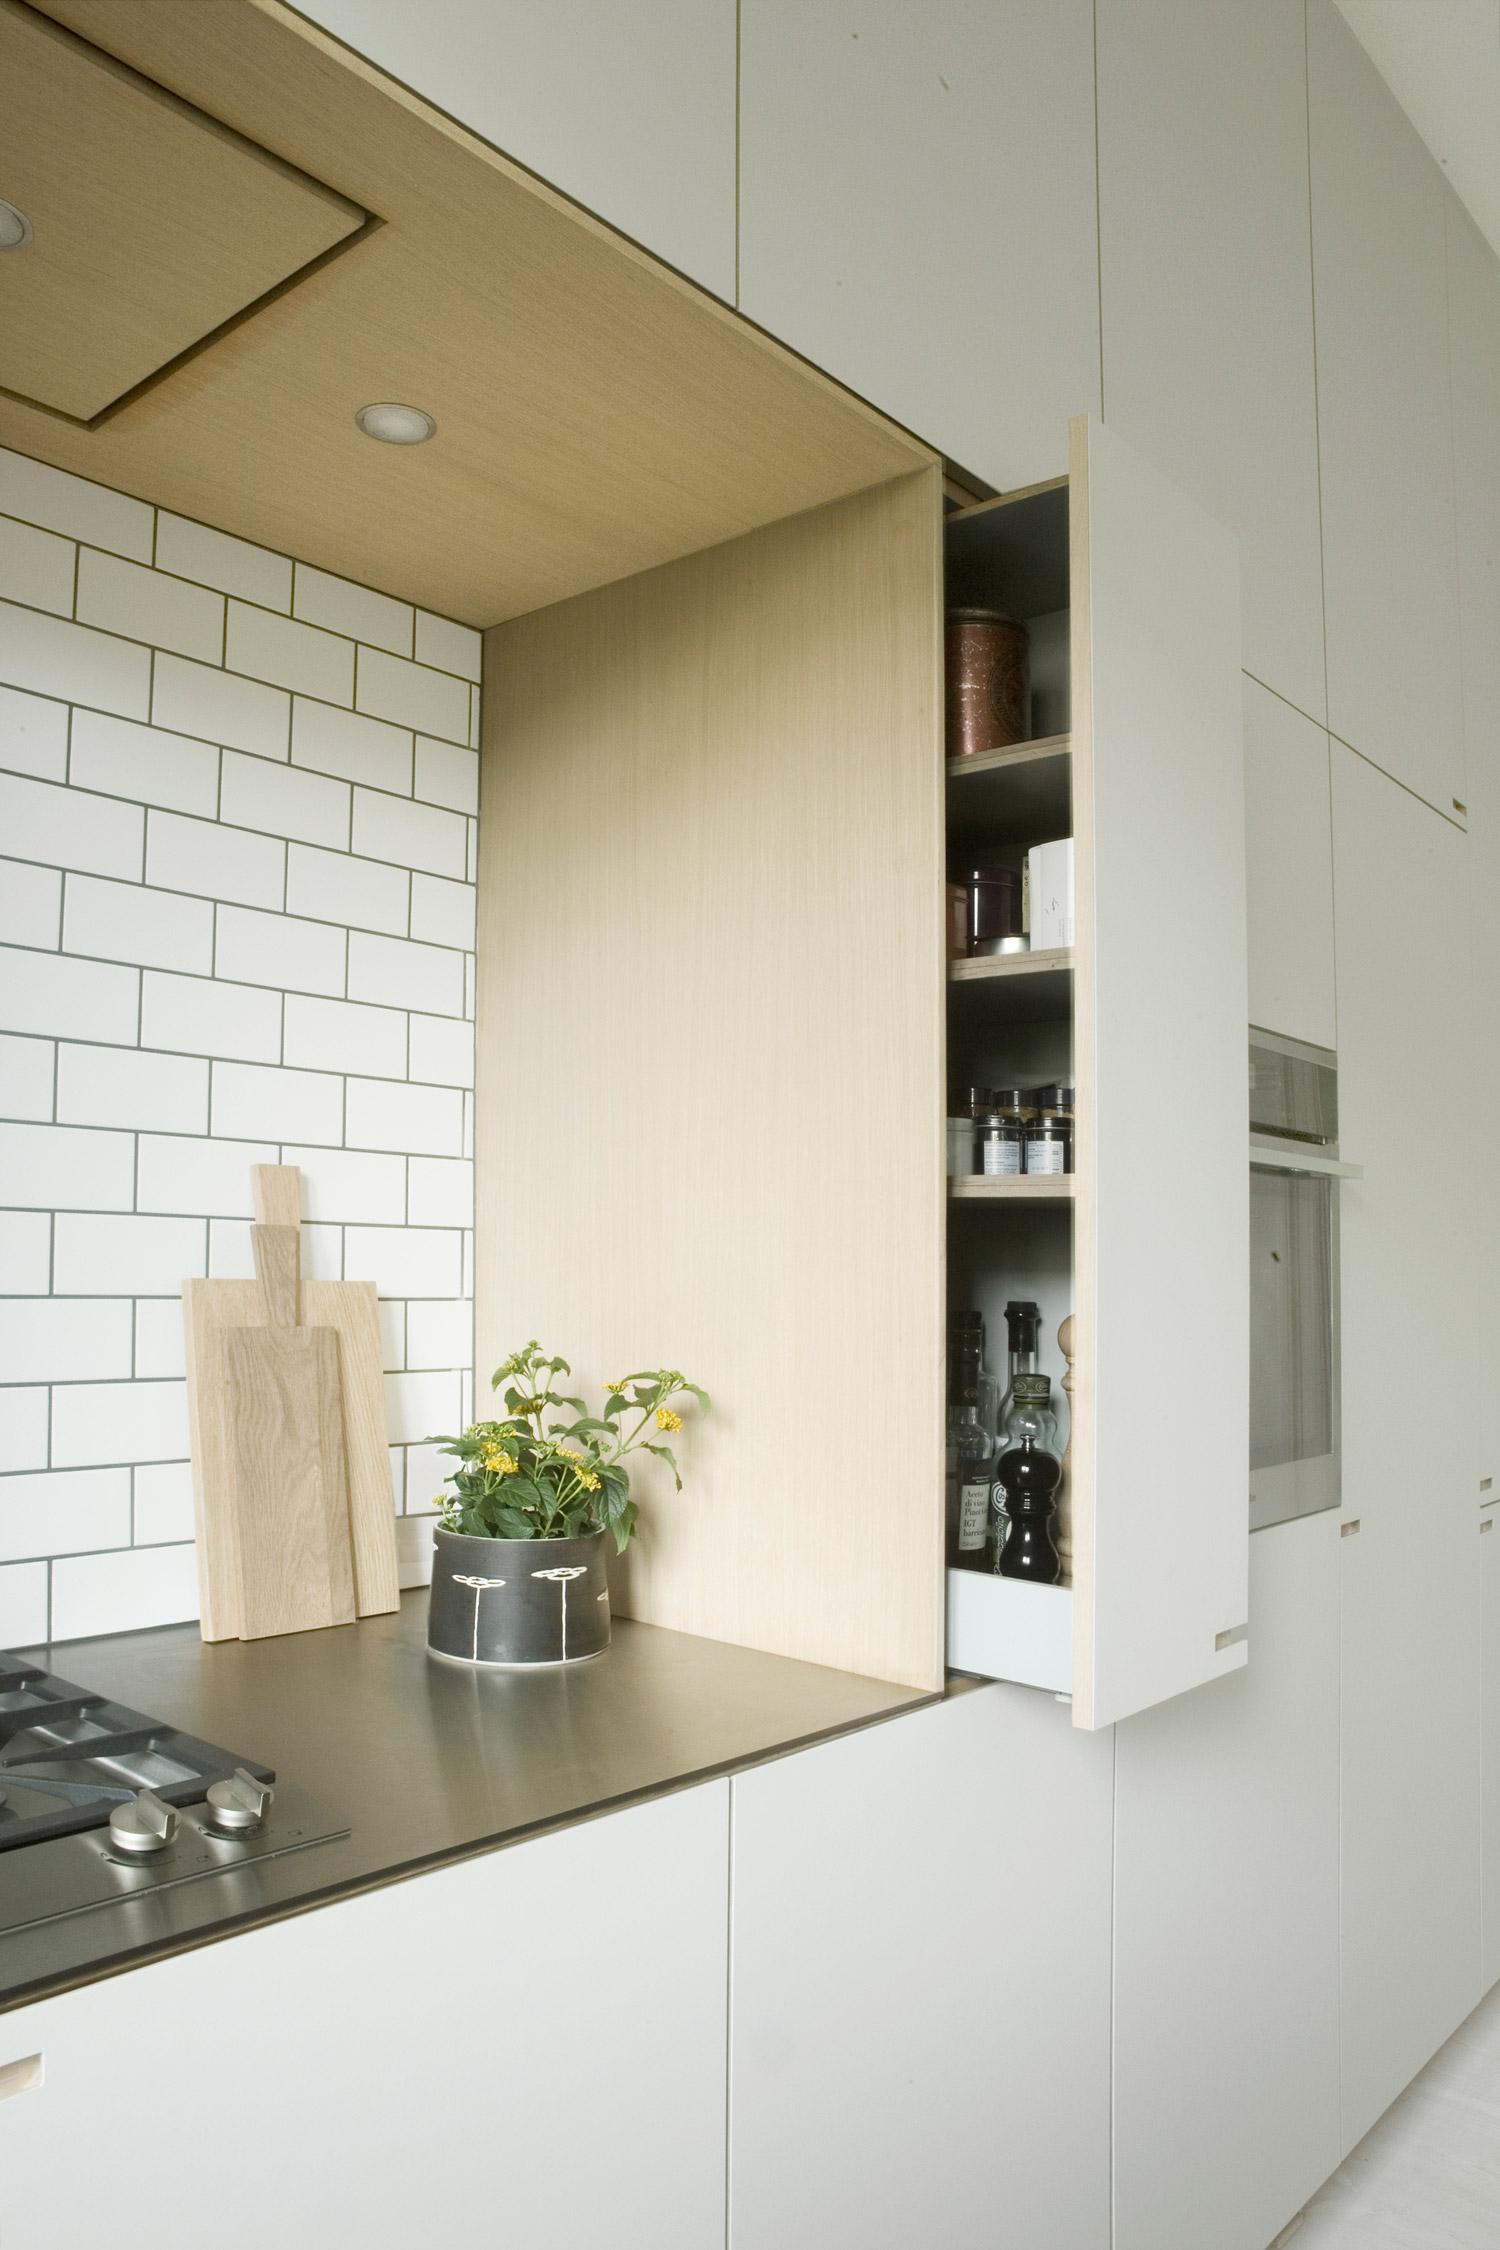 Snedkerkøkken i støvet sand og blå linoleum - af køkkensnedker Nicolaj Bo™